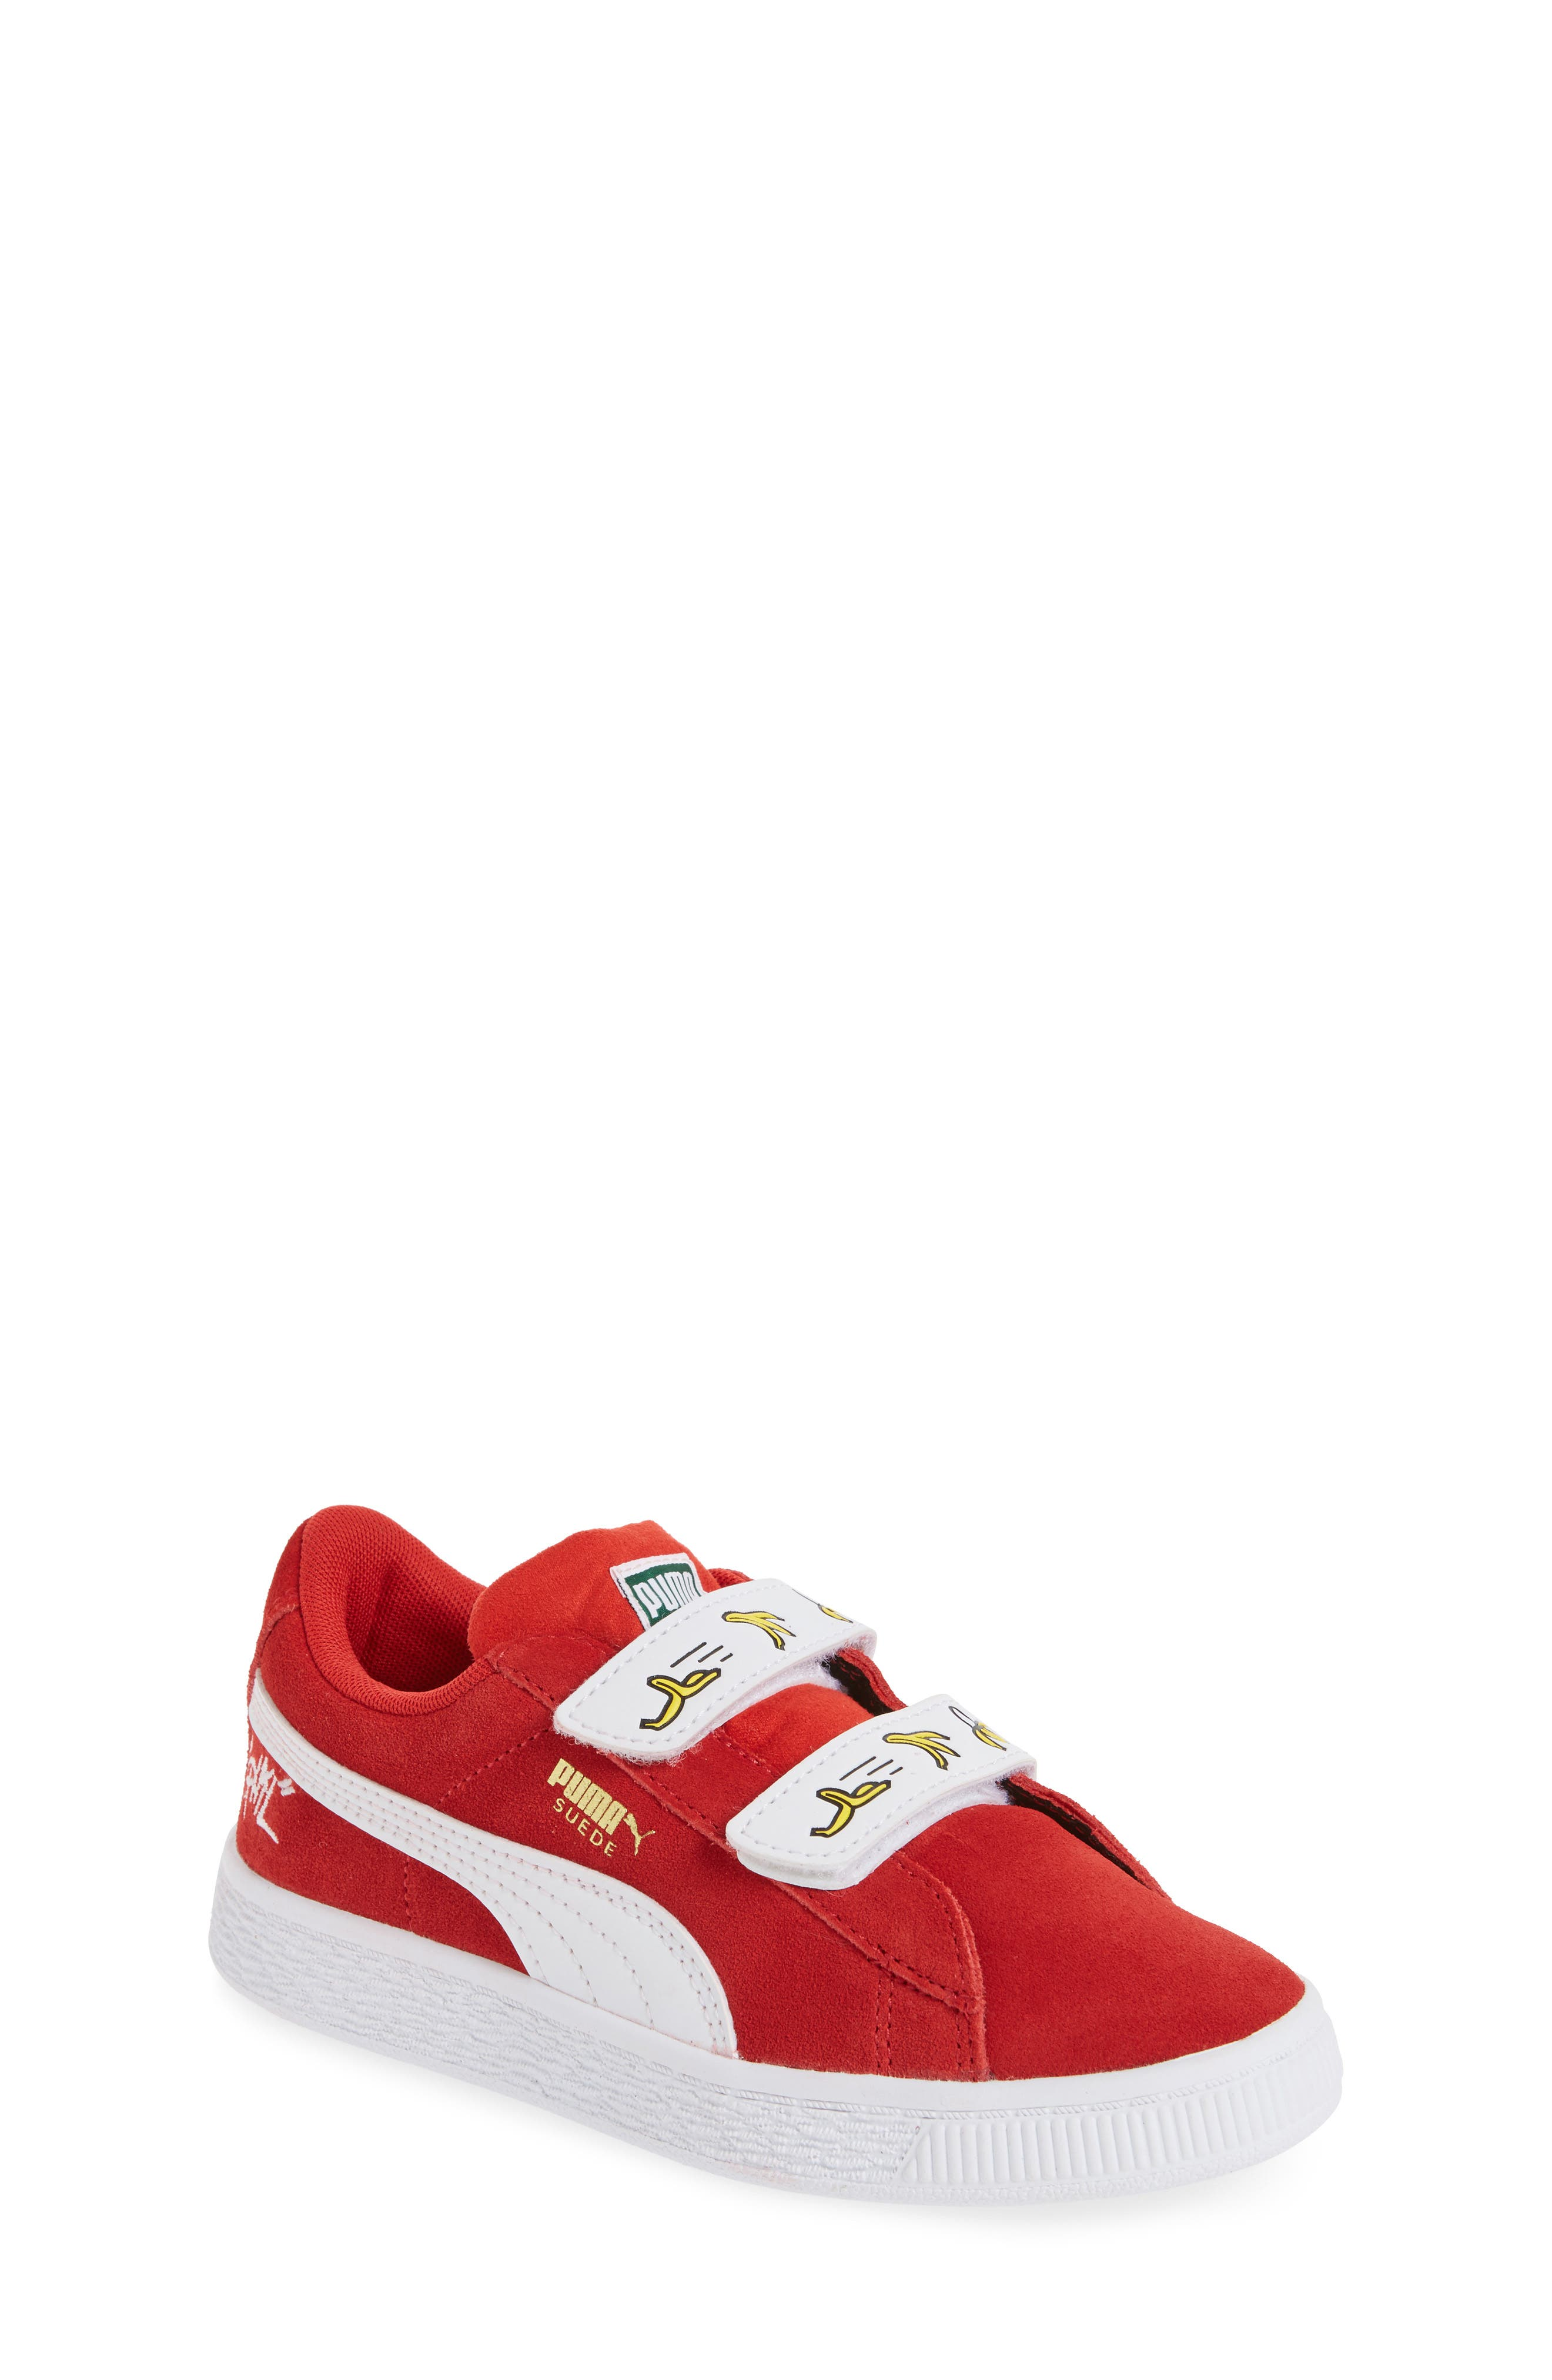 PUMA x Minions Suede V Sneaker (Baby, Walker, Toddler, Little Kid & Big Kid)